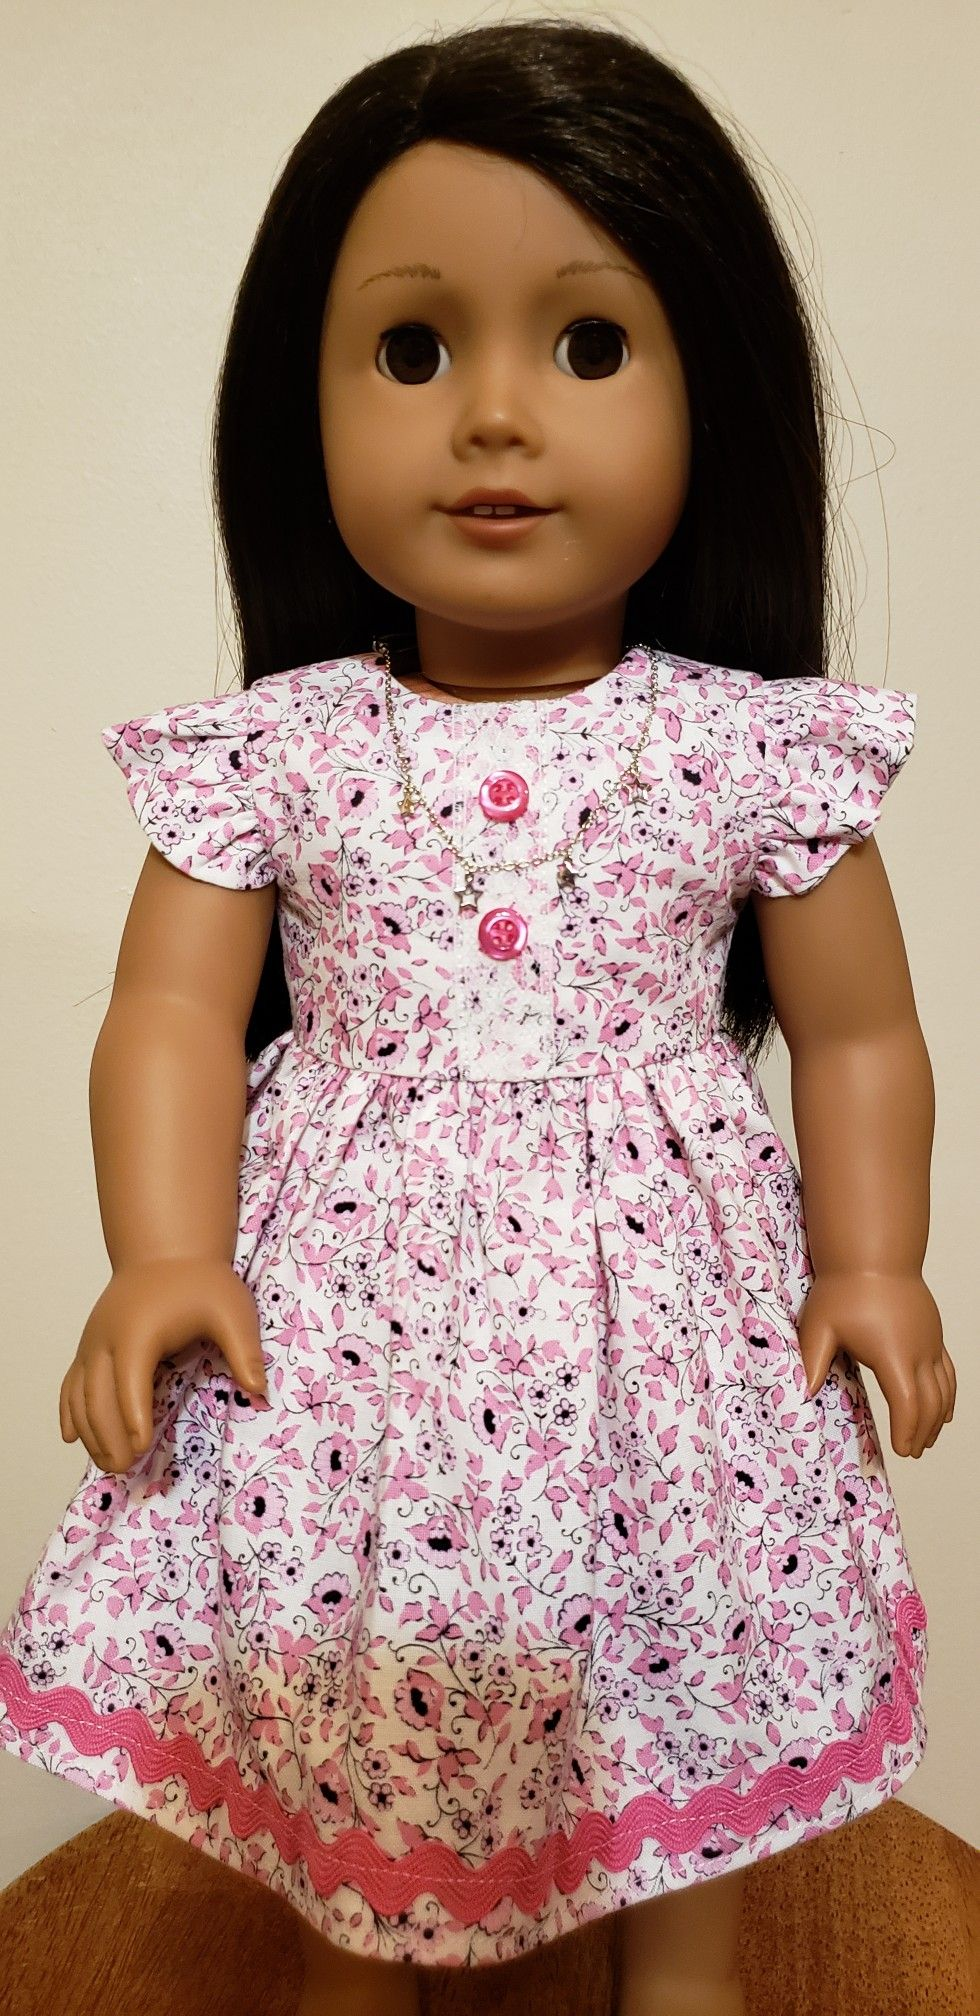 American Girl Ruffle Sleeve Dress For Rosie Doll Clothes American Girl American Girl Doll